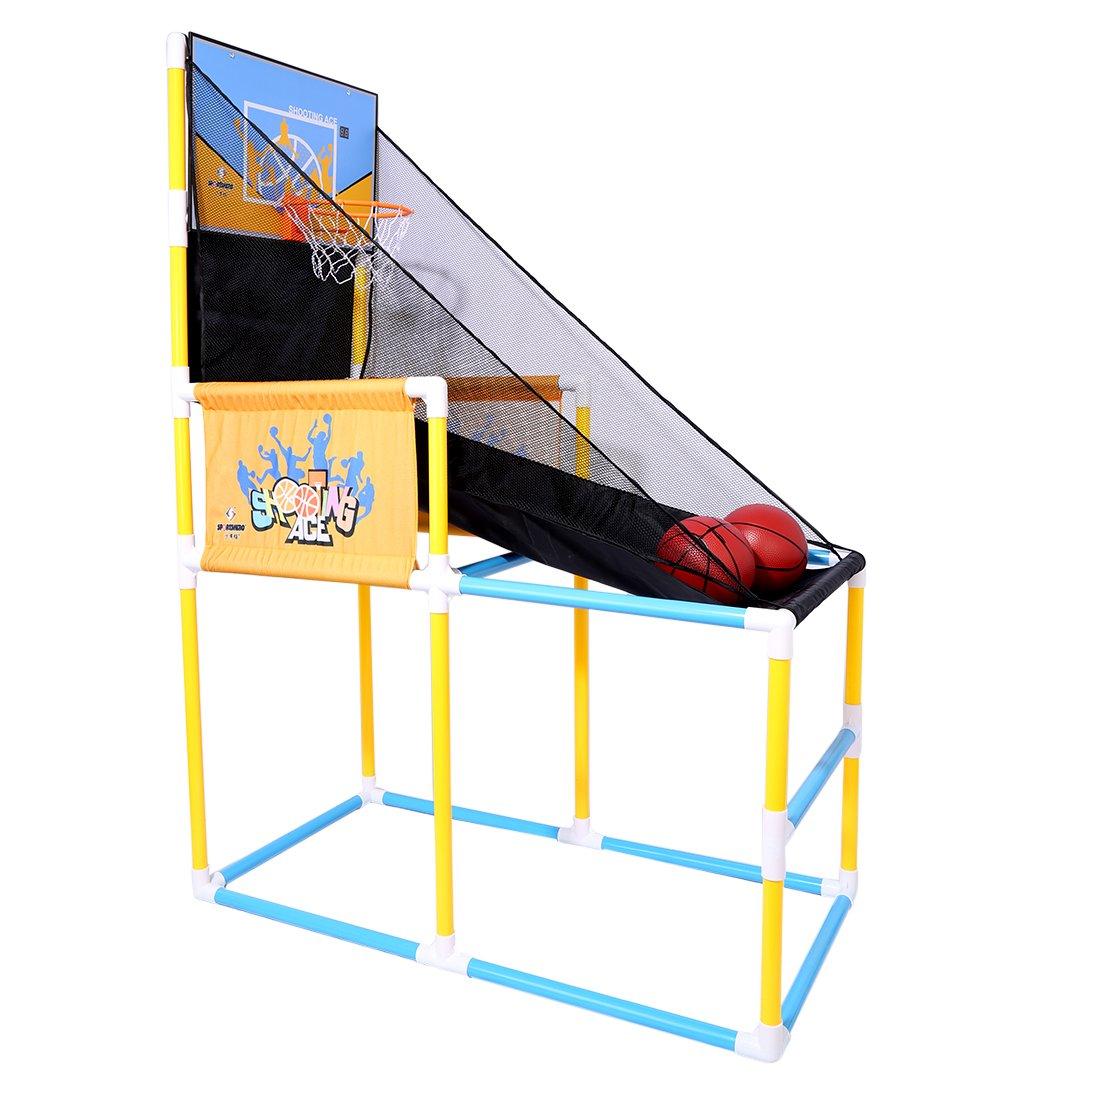 PINCHUANGHUI Automatic Scoring Basketball Shooting Machine Kids Teenagers Shooting Hoop